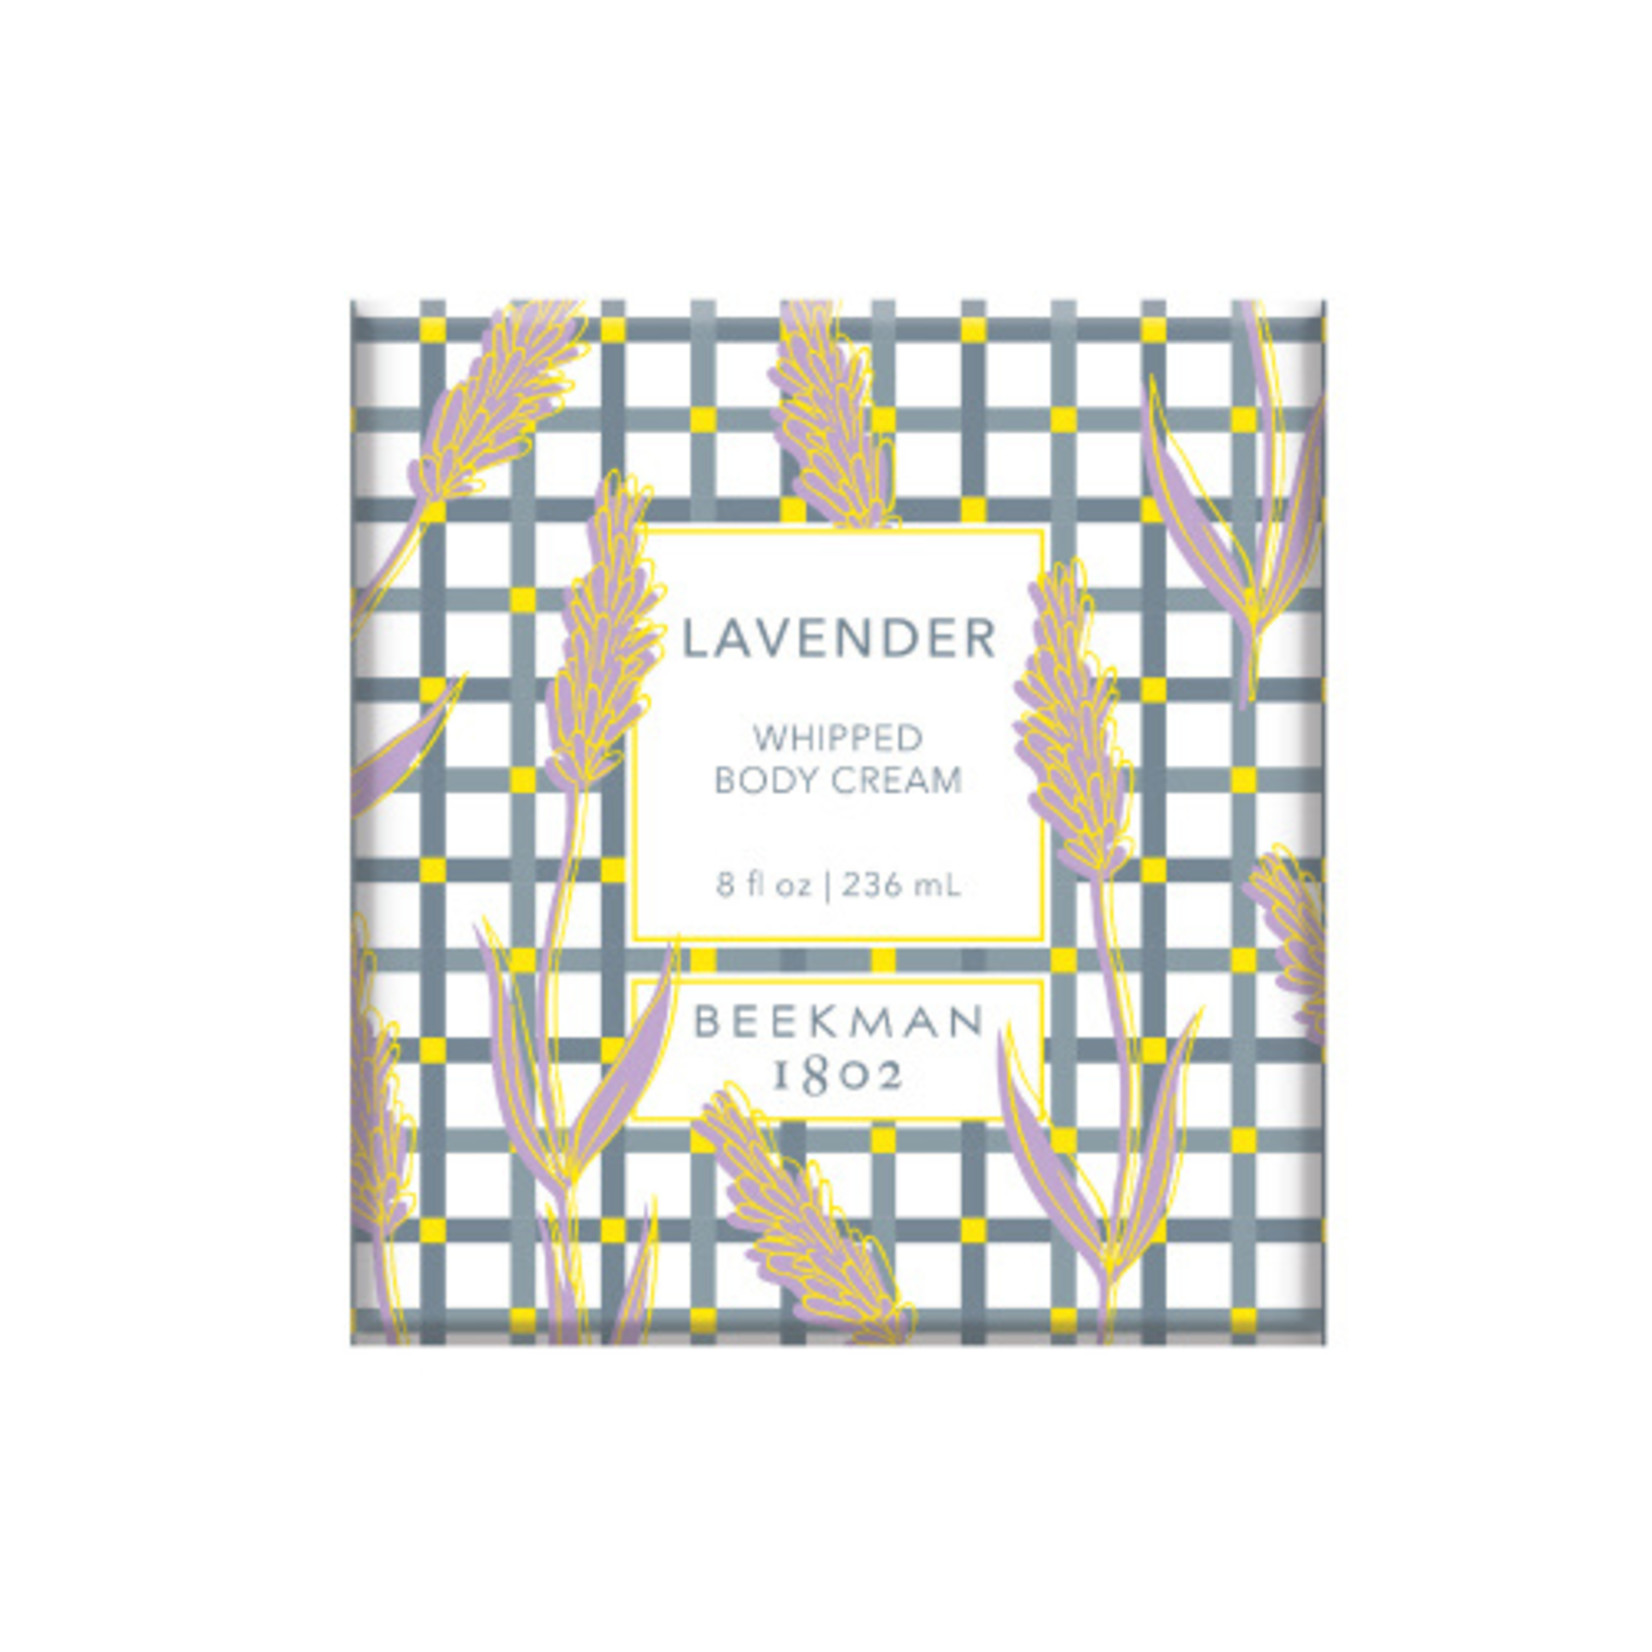 BEEKMAN 1802 Lavender Whipped Body Cream